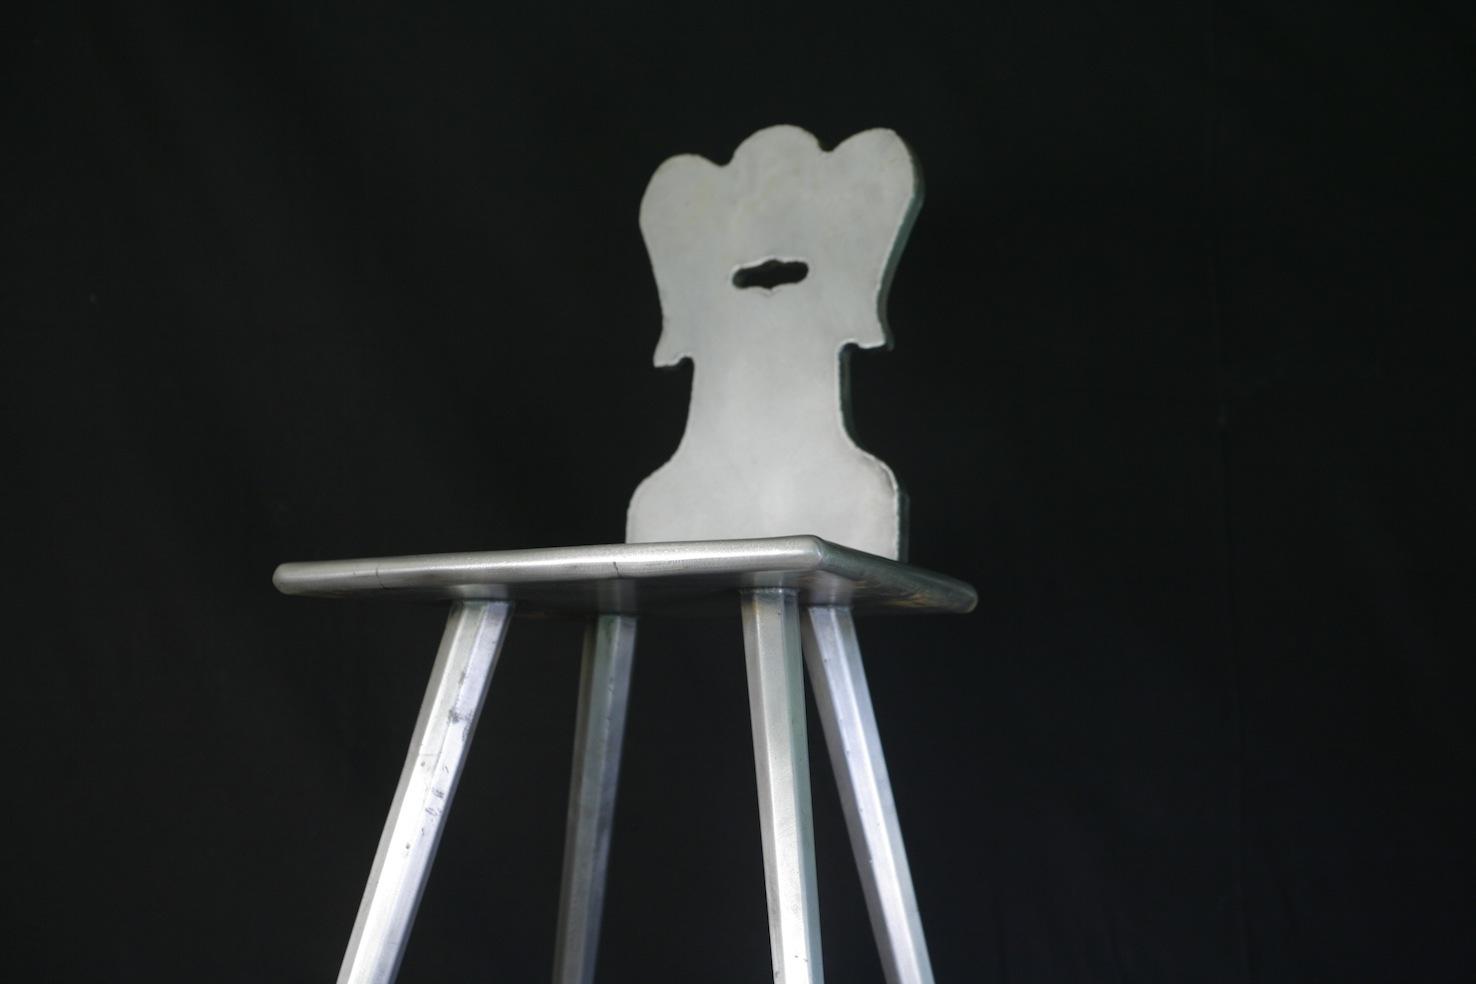 ‹ ‹ Design Design ‹ De Alsaciennes Alsaciennes Chaises Alsaciennes Chaises Chaises De 0PkXnwN8O